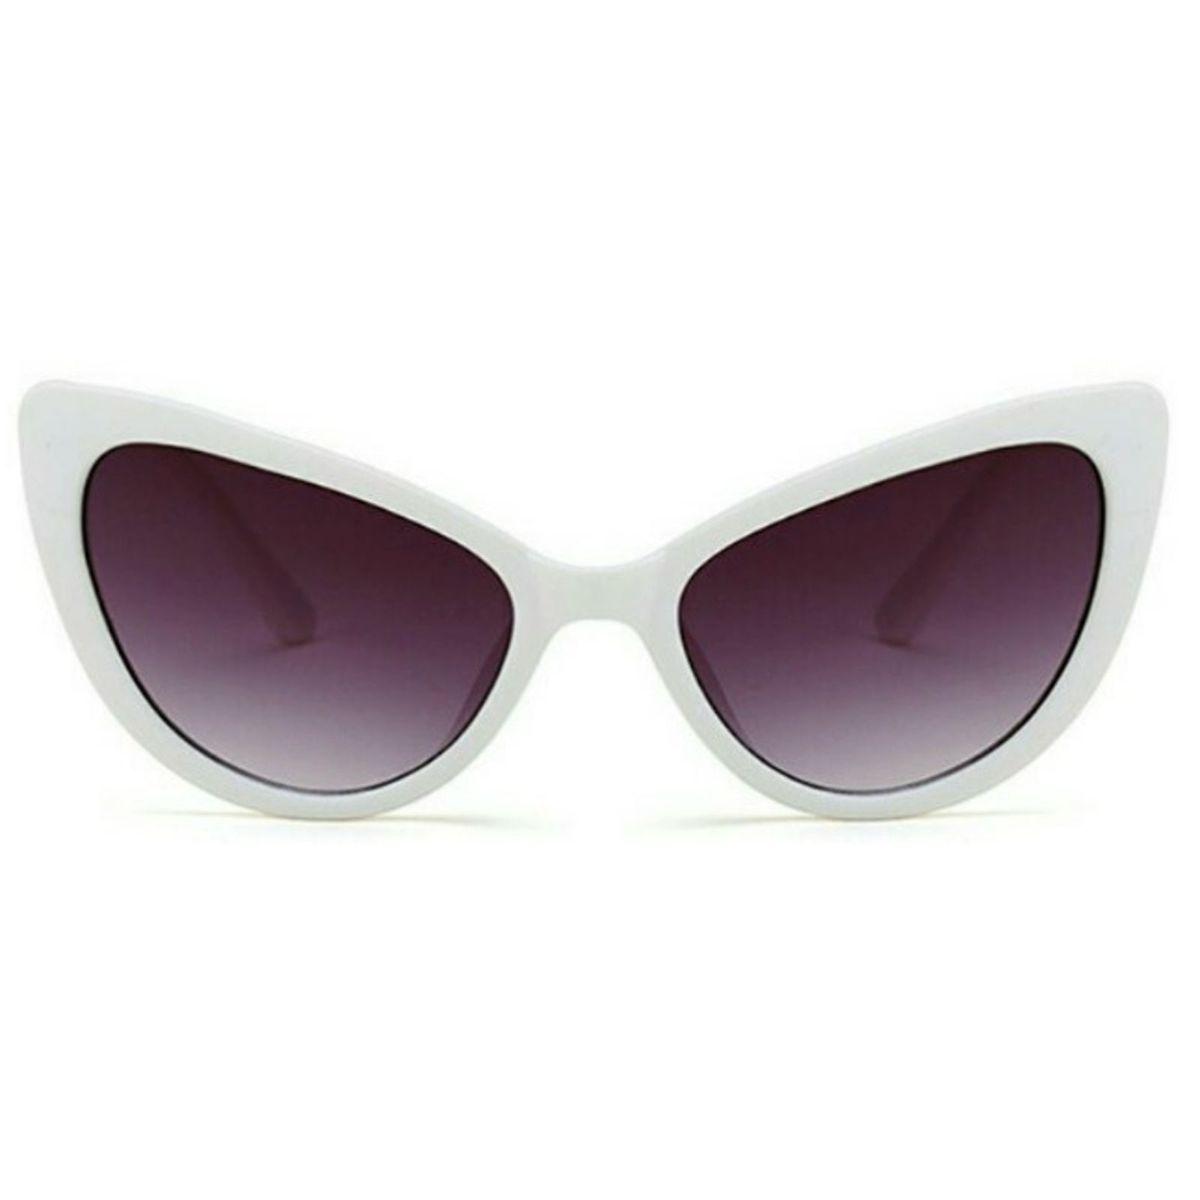 15c6247f7 Óculos Gatinho Retro Branco   Óculos Feminino Genie Vintage Usado 30910026    enjoei